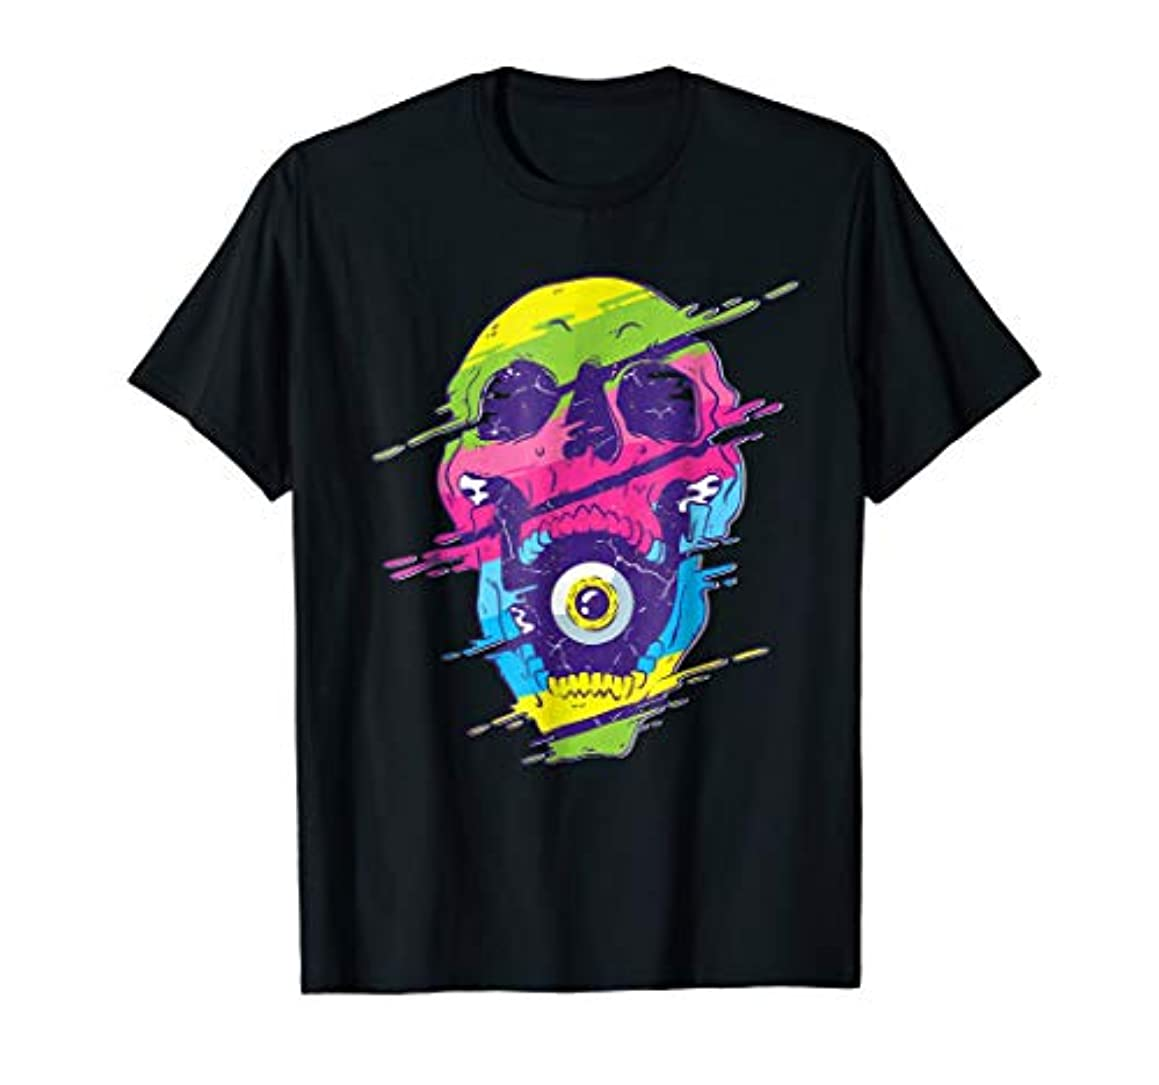 Colorful Melting Skull Art Graphic Party EDM Rave TShirt